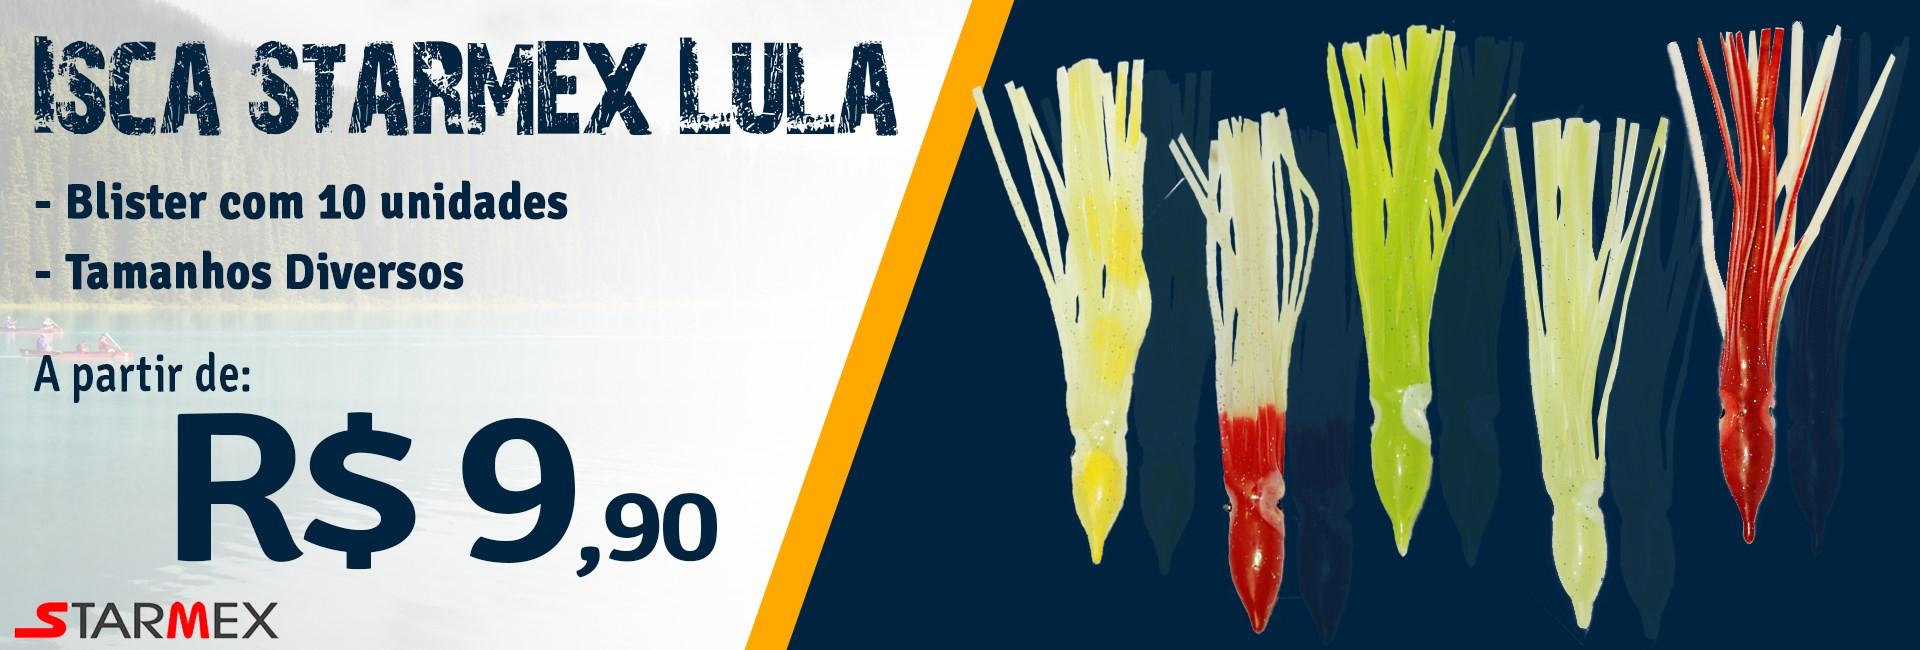 Isca Starmex Lula